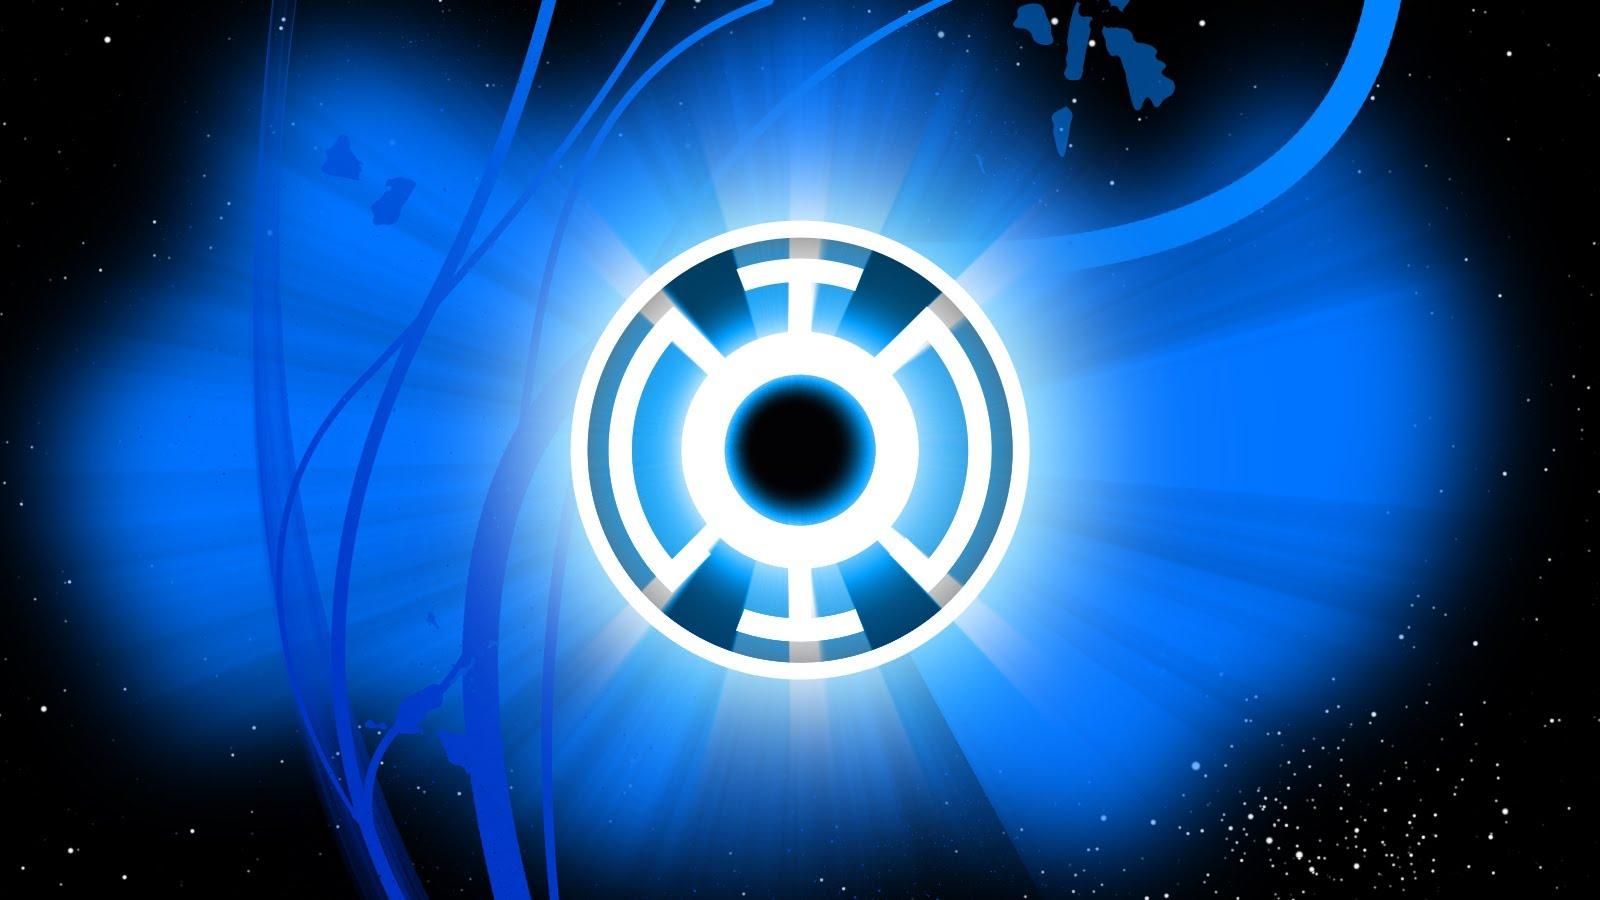 Blue Lantern wallpapers Comics HQ Blue Lantern pictures 4K 1600x900